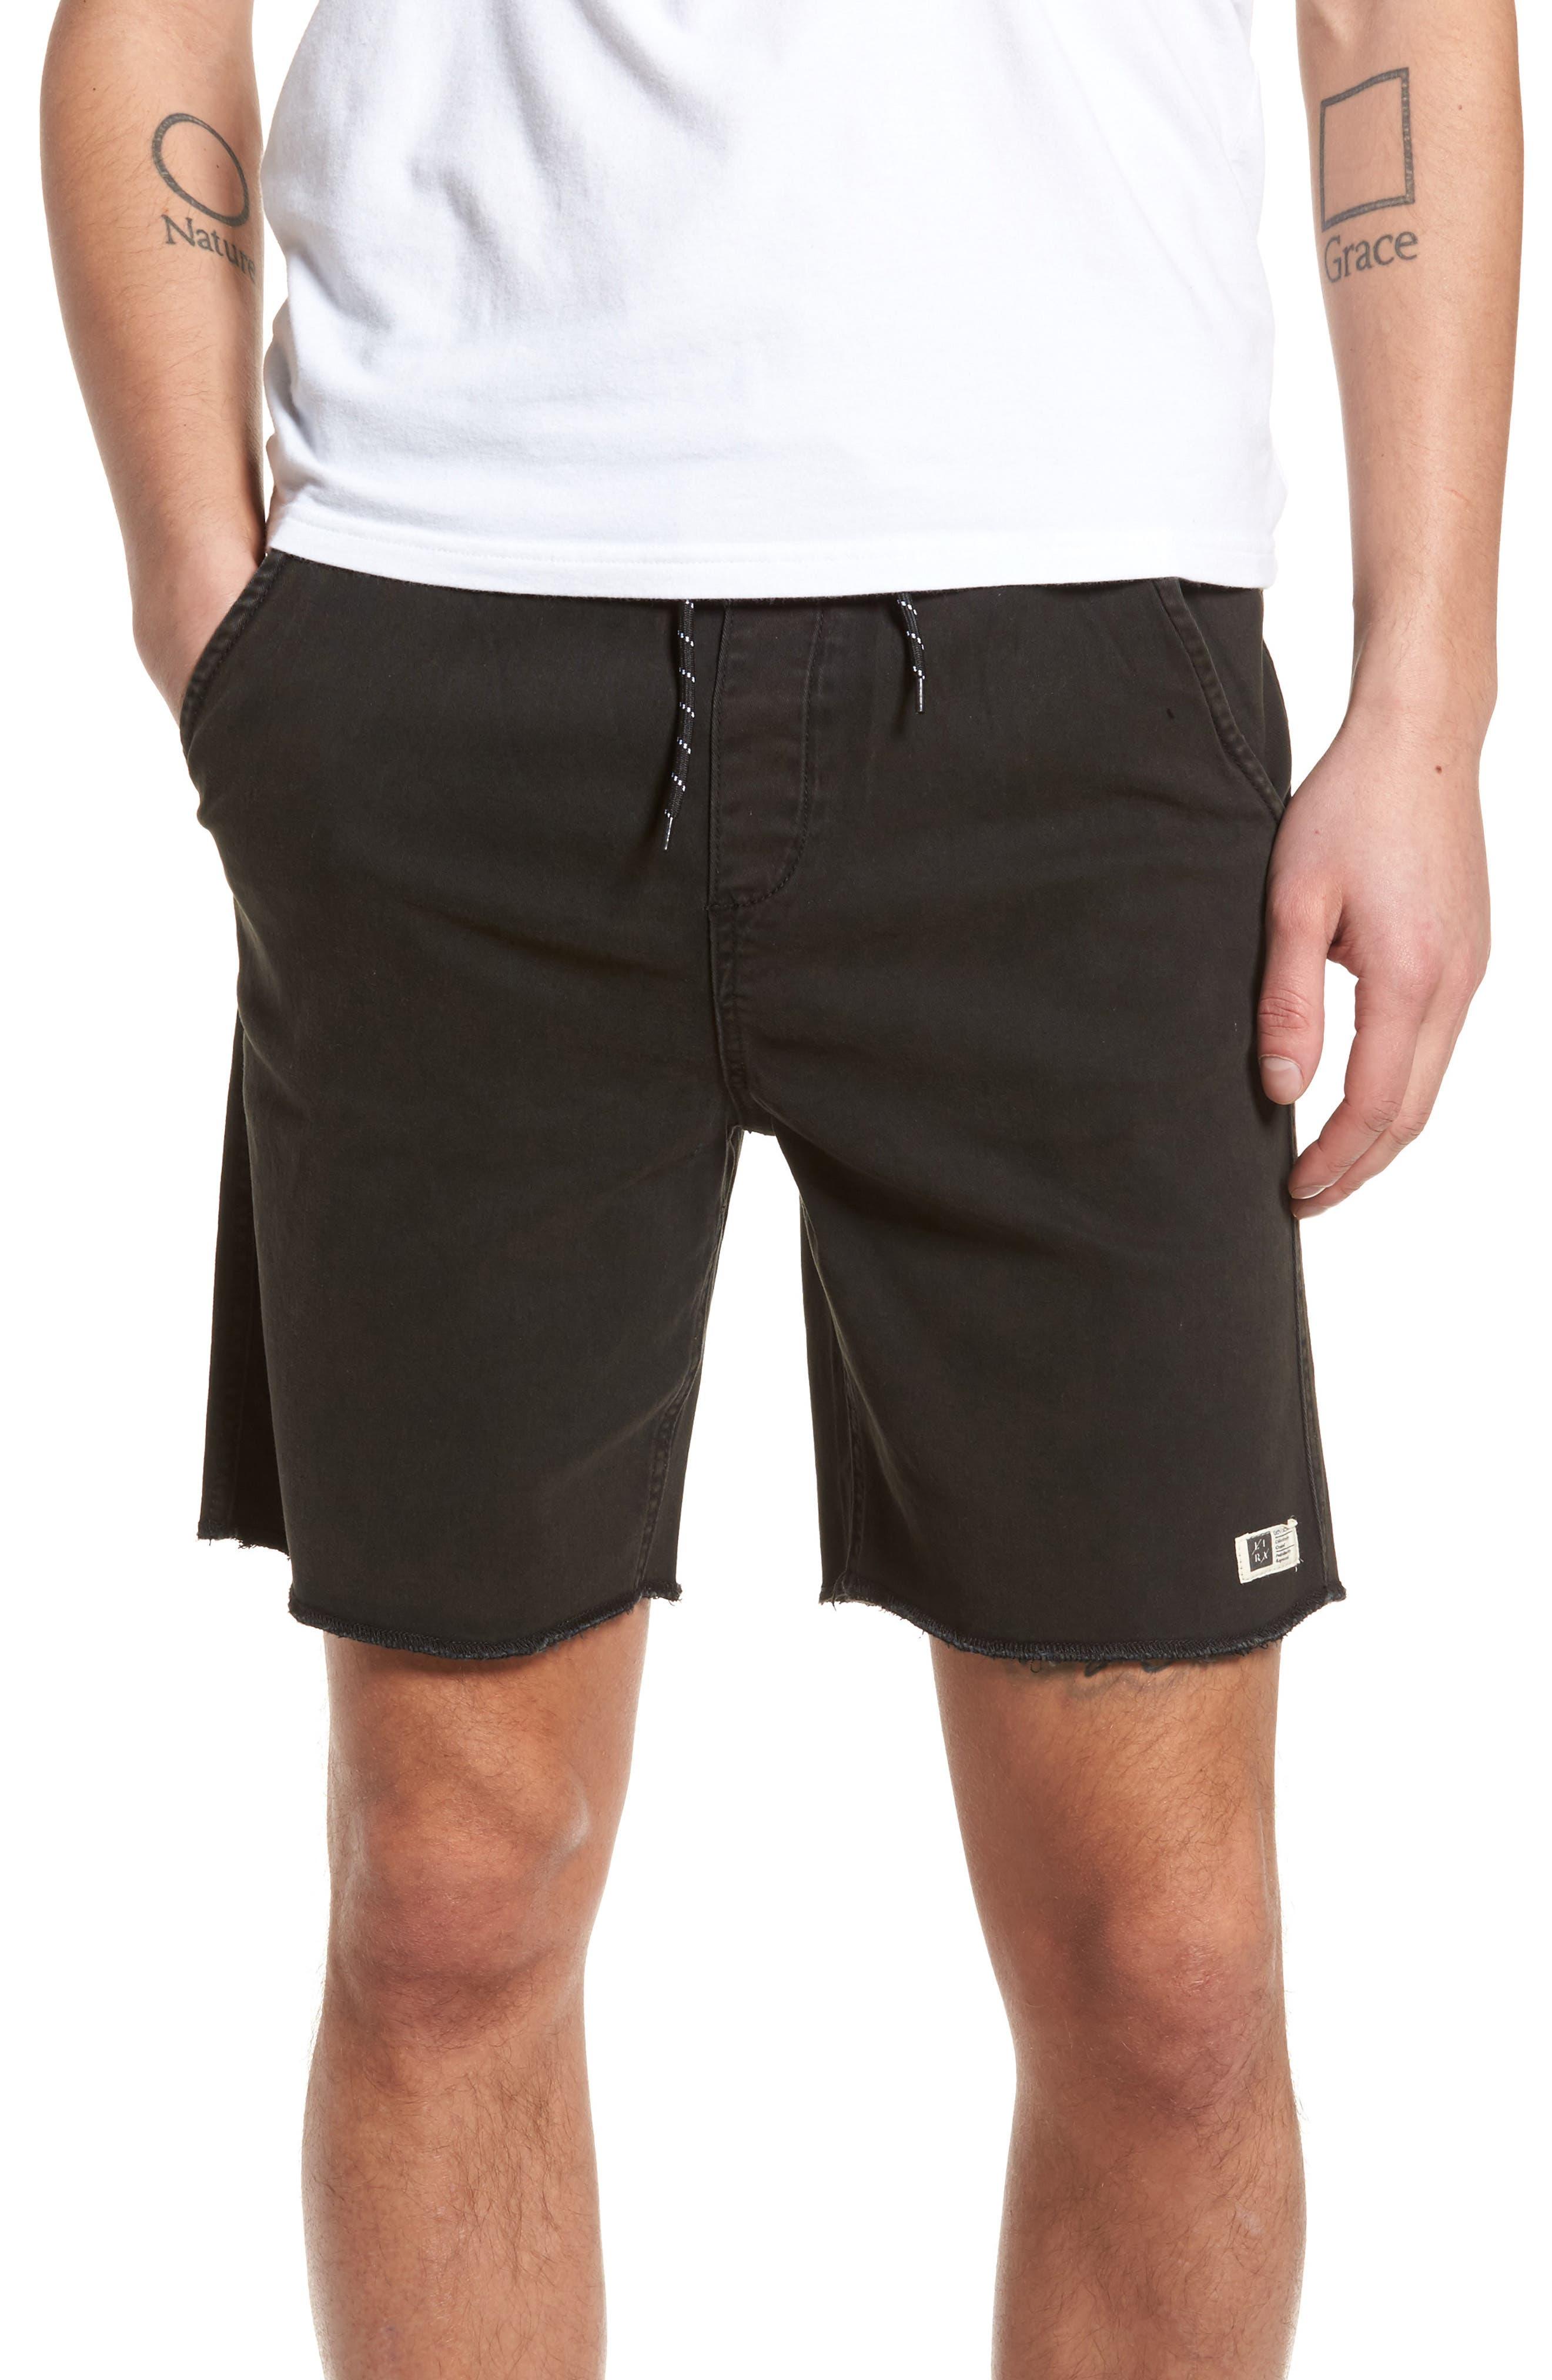 Alternate Image 1 Selected - Lira Clothing Frazier Walk Shorts